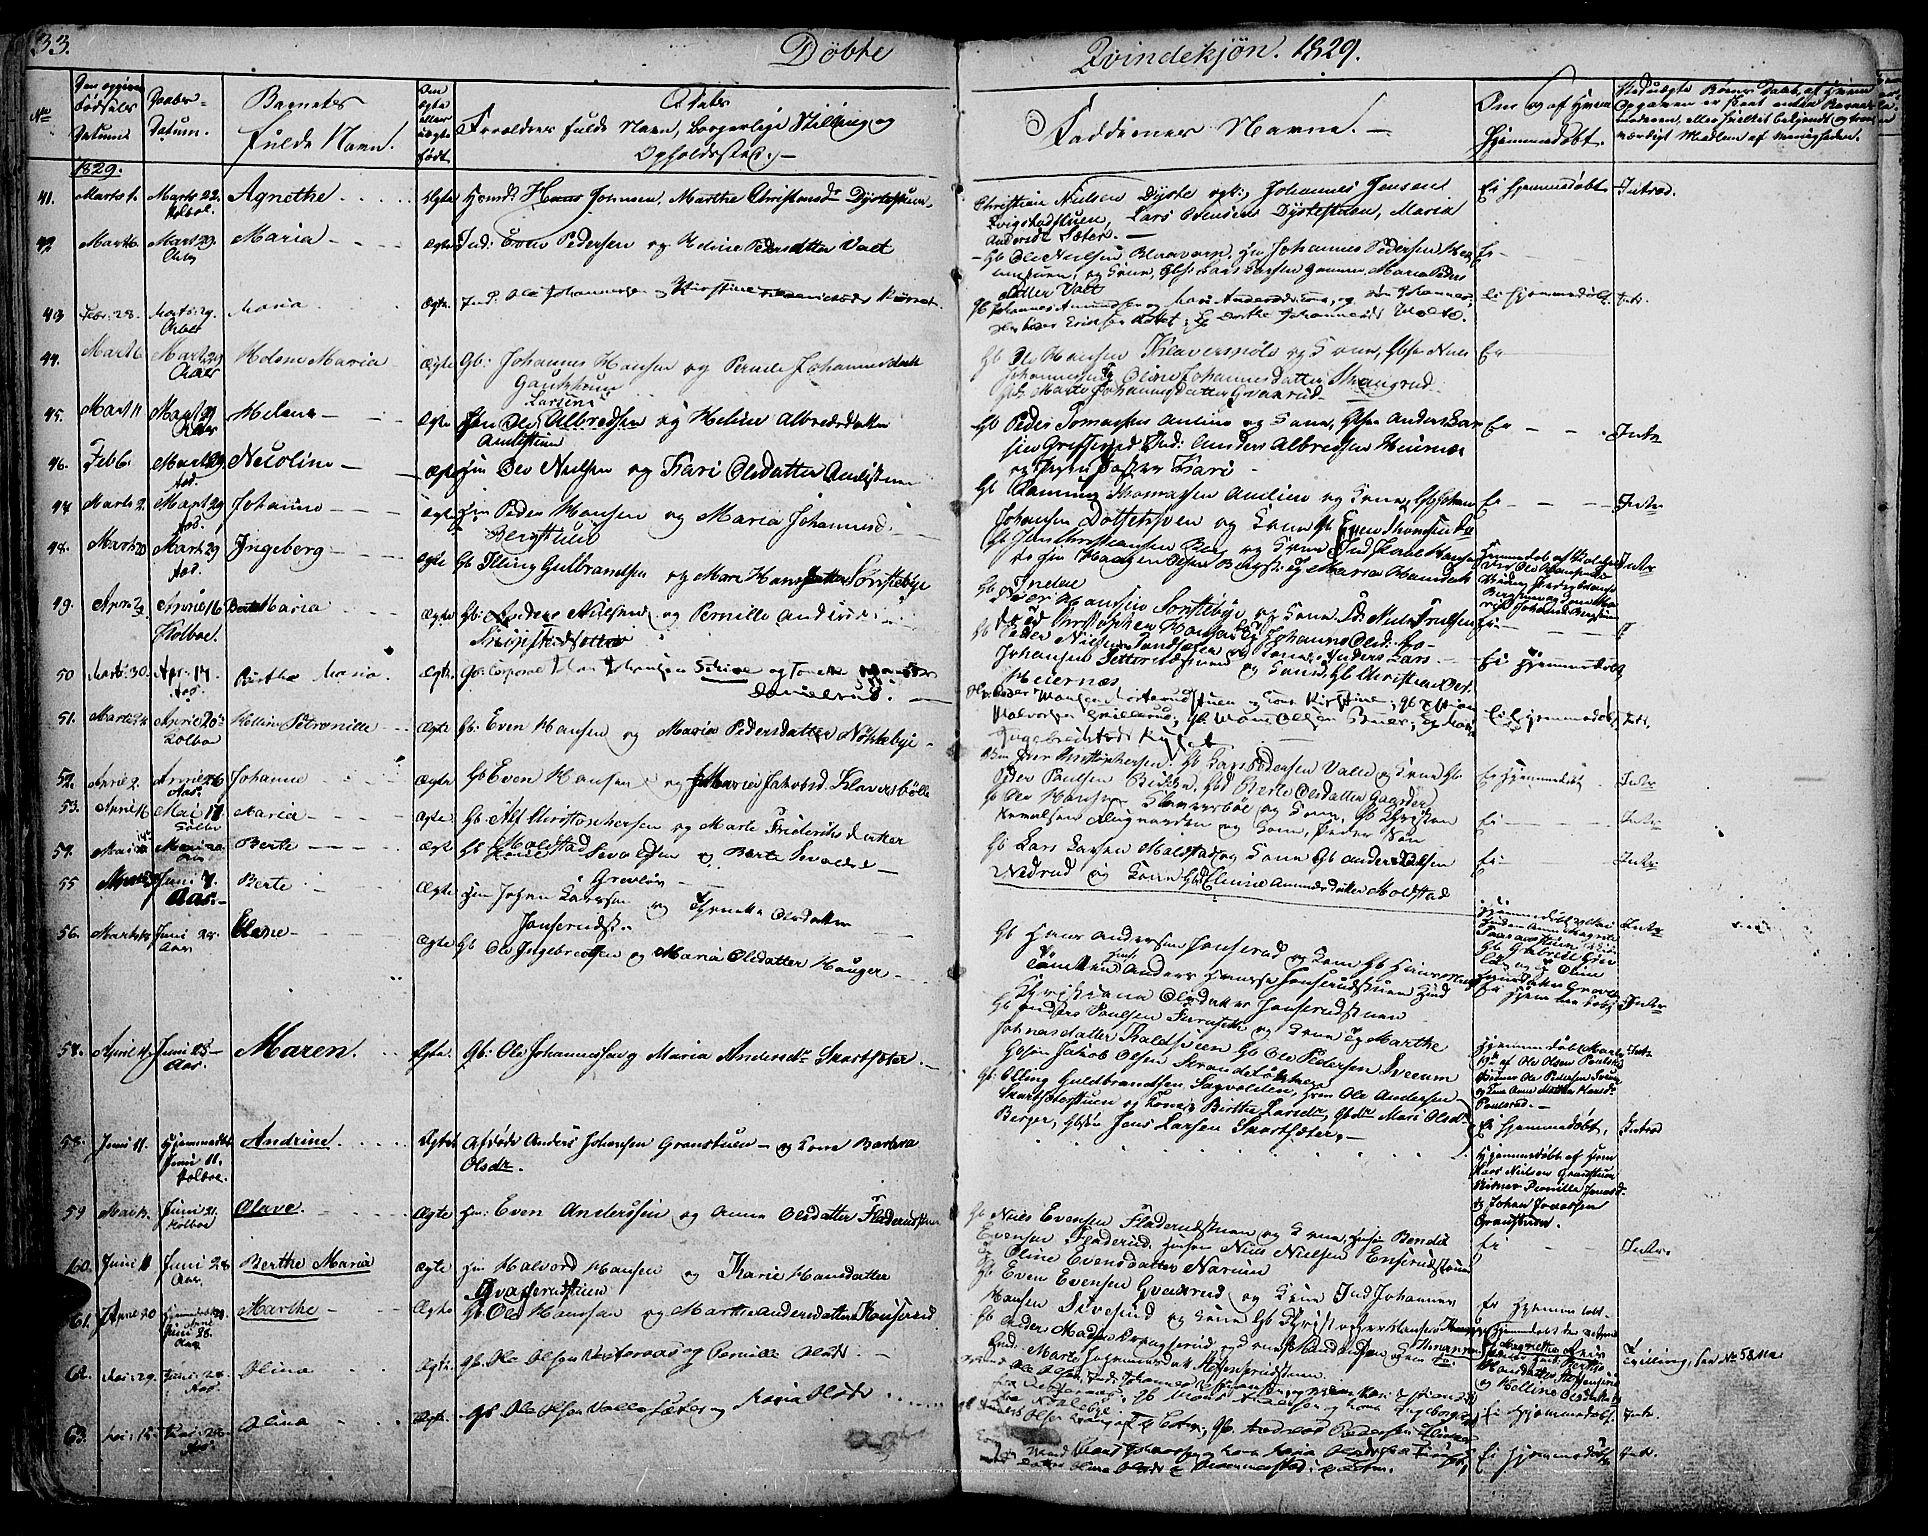 SAH, Vestre Toten prestekontor, H/Ha/Haa/L0002: Ministerialbok nr. 2, 1825-1837, s. 33